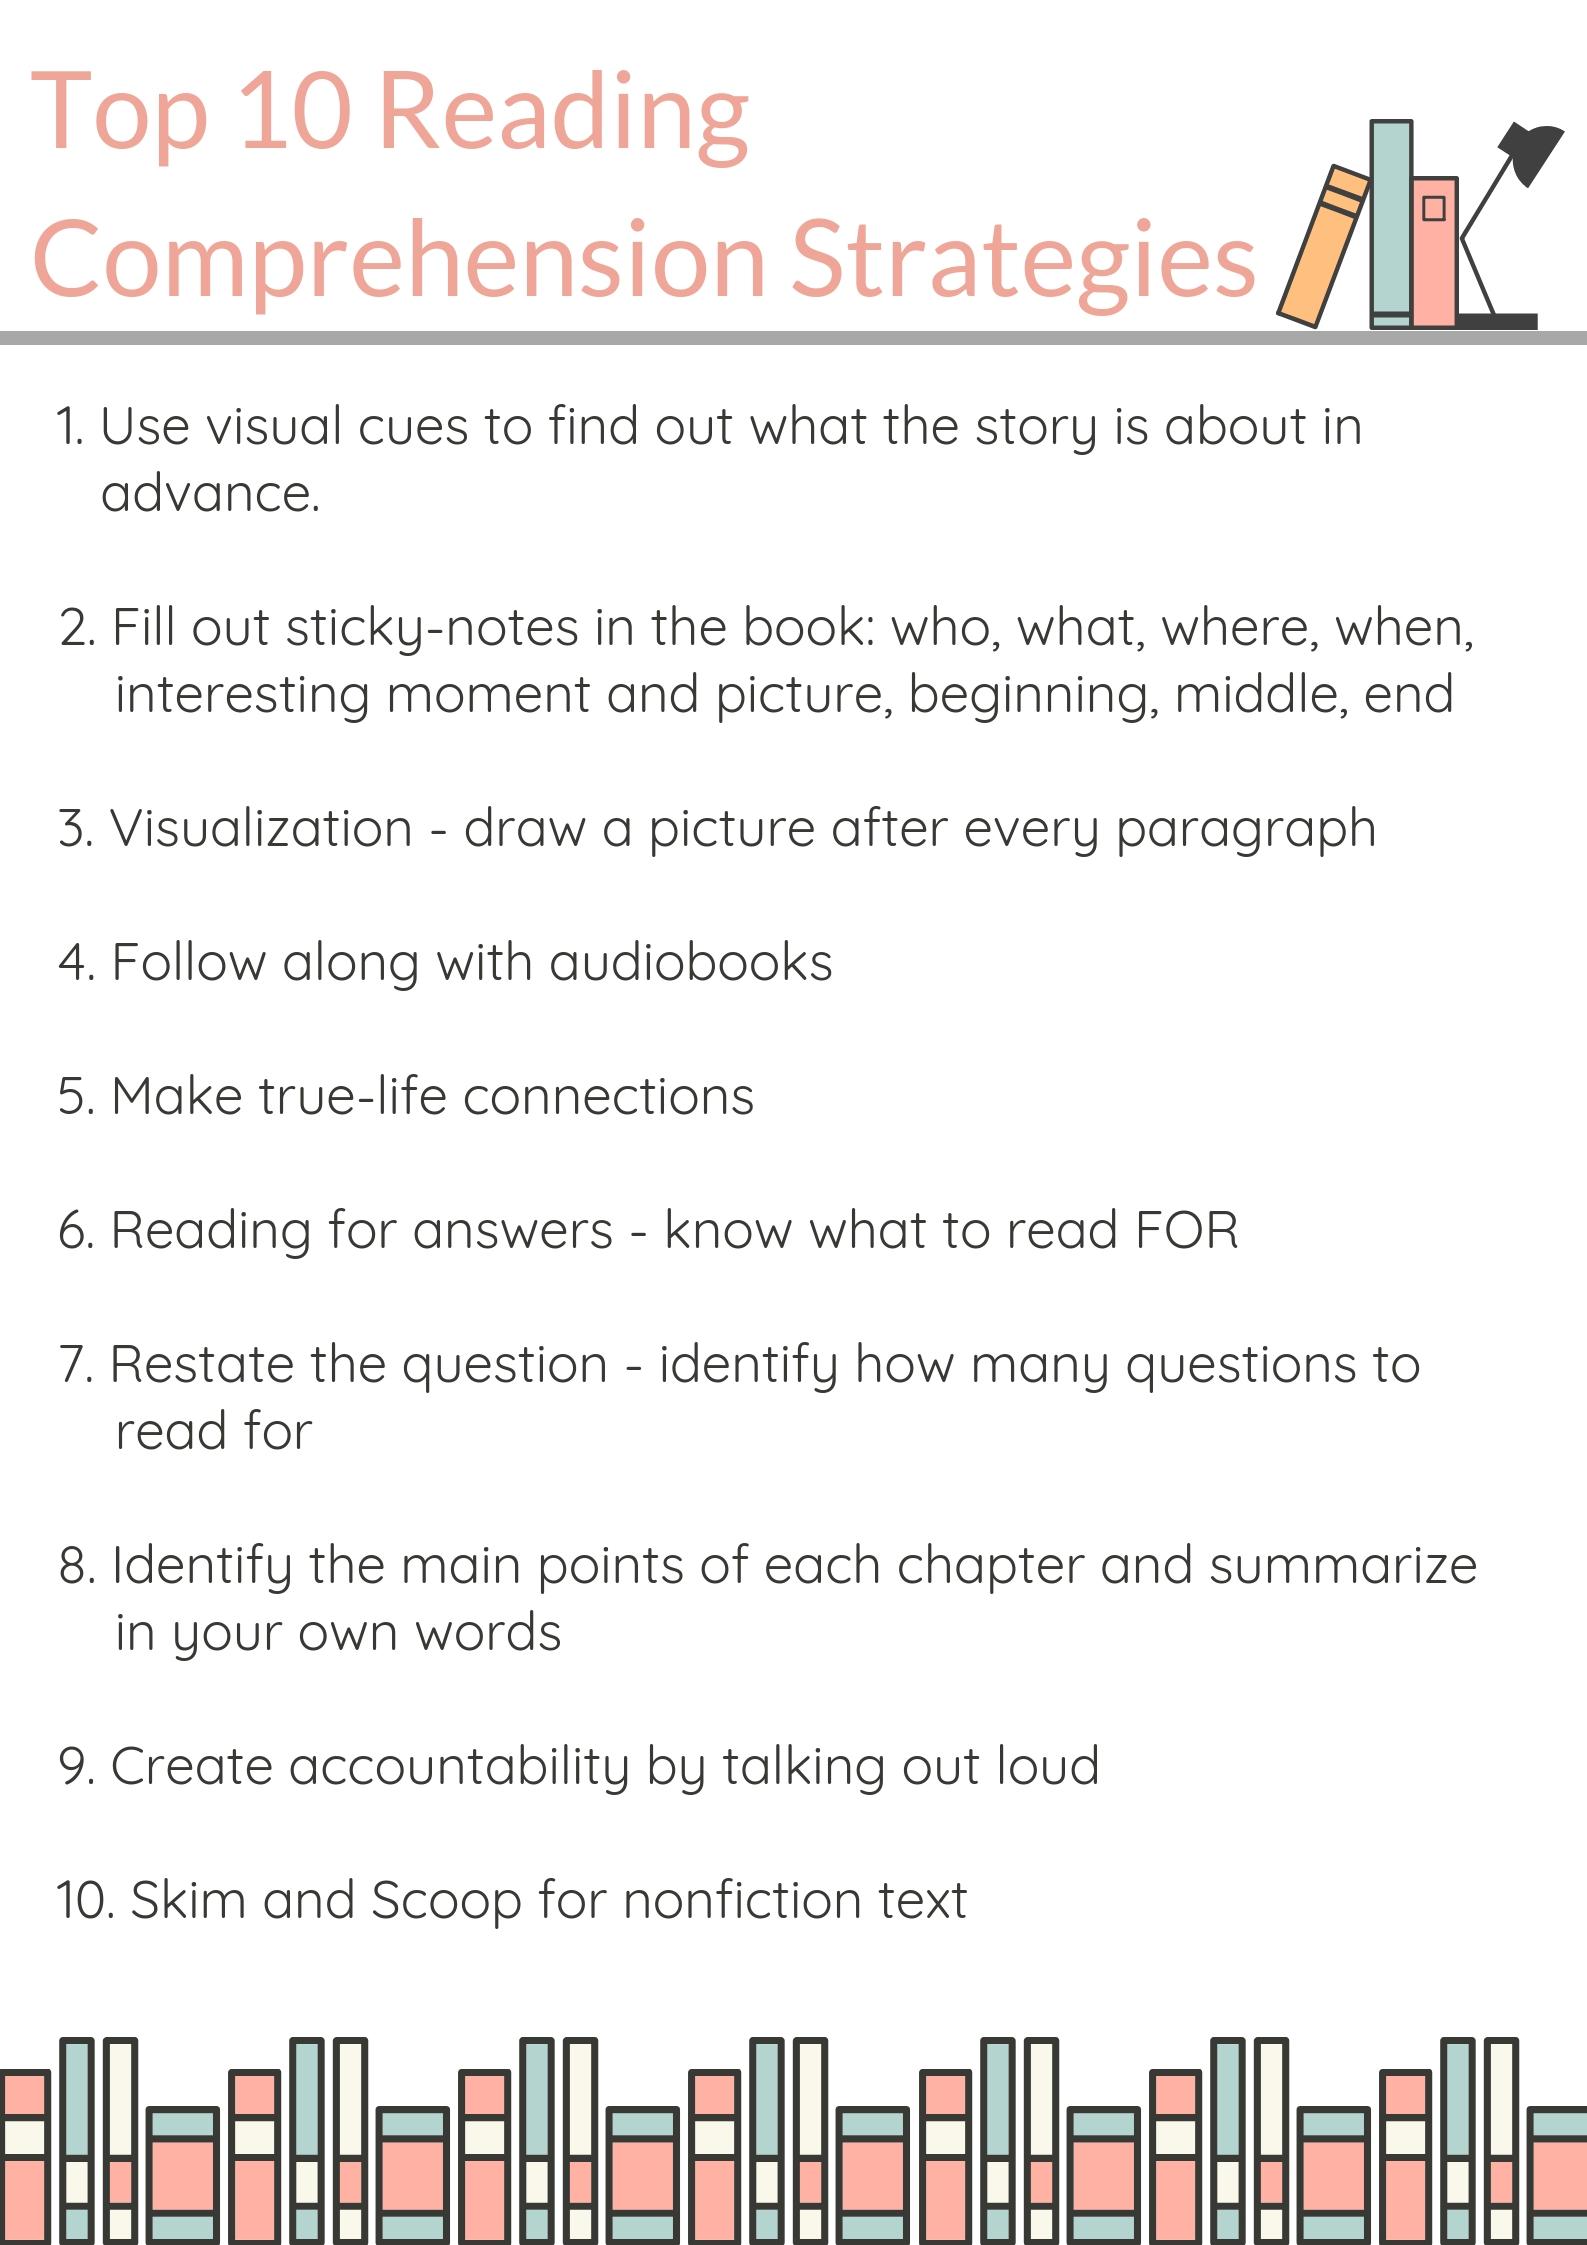 Top 10 Reading Comprehension Strategies